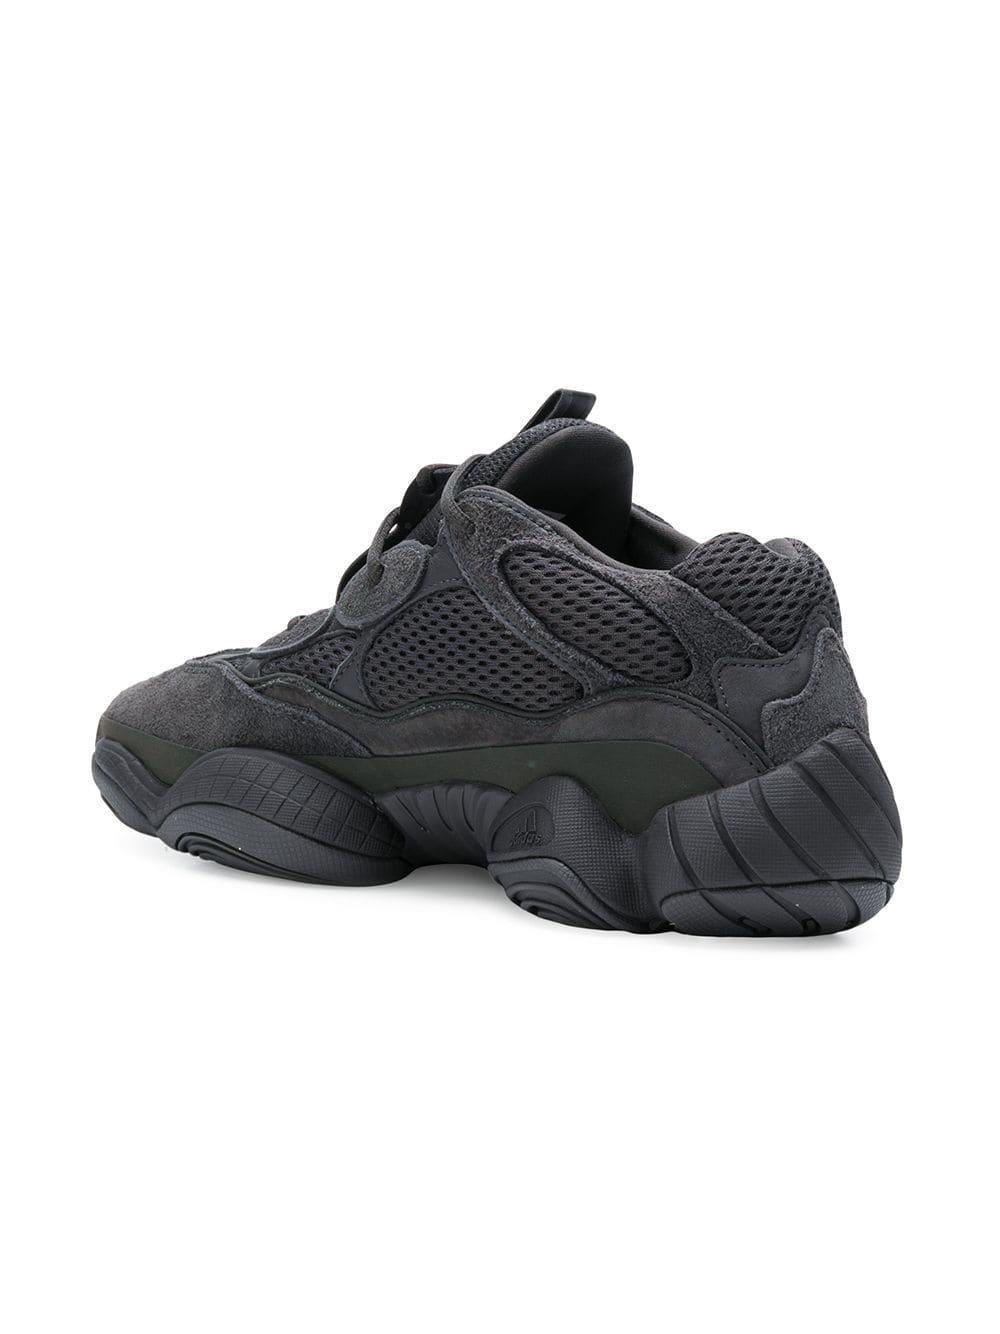 a3f50444507c4 Lyst - Yeezy 500 Sneakers in Black for Men